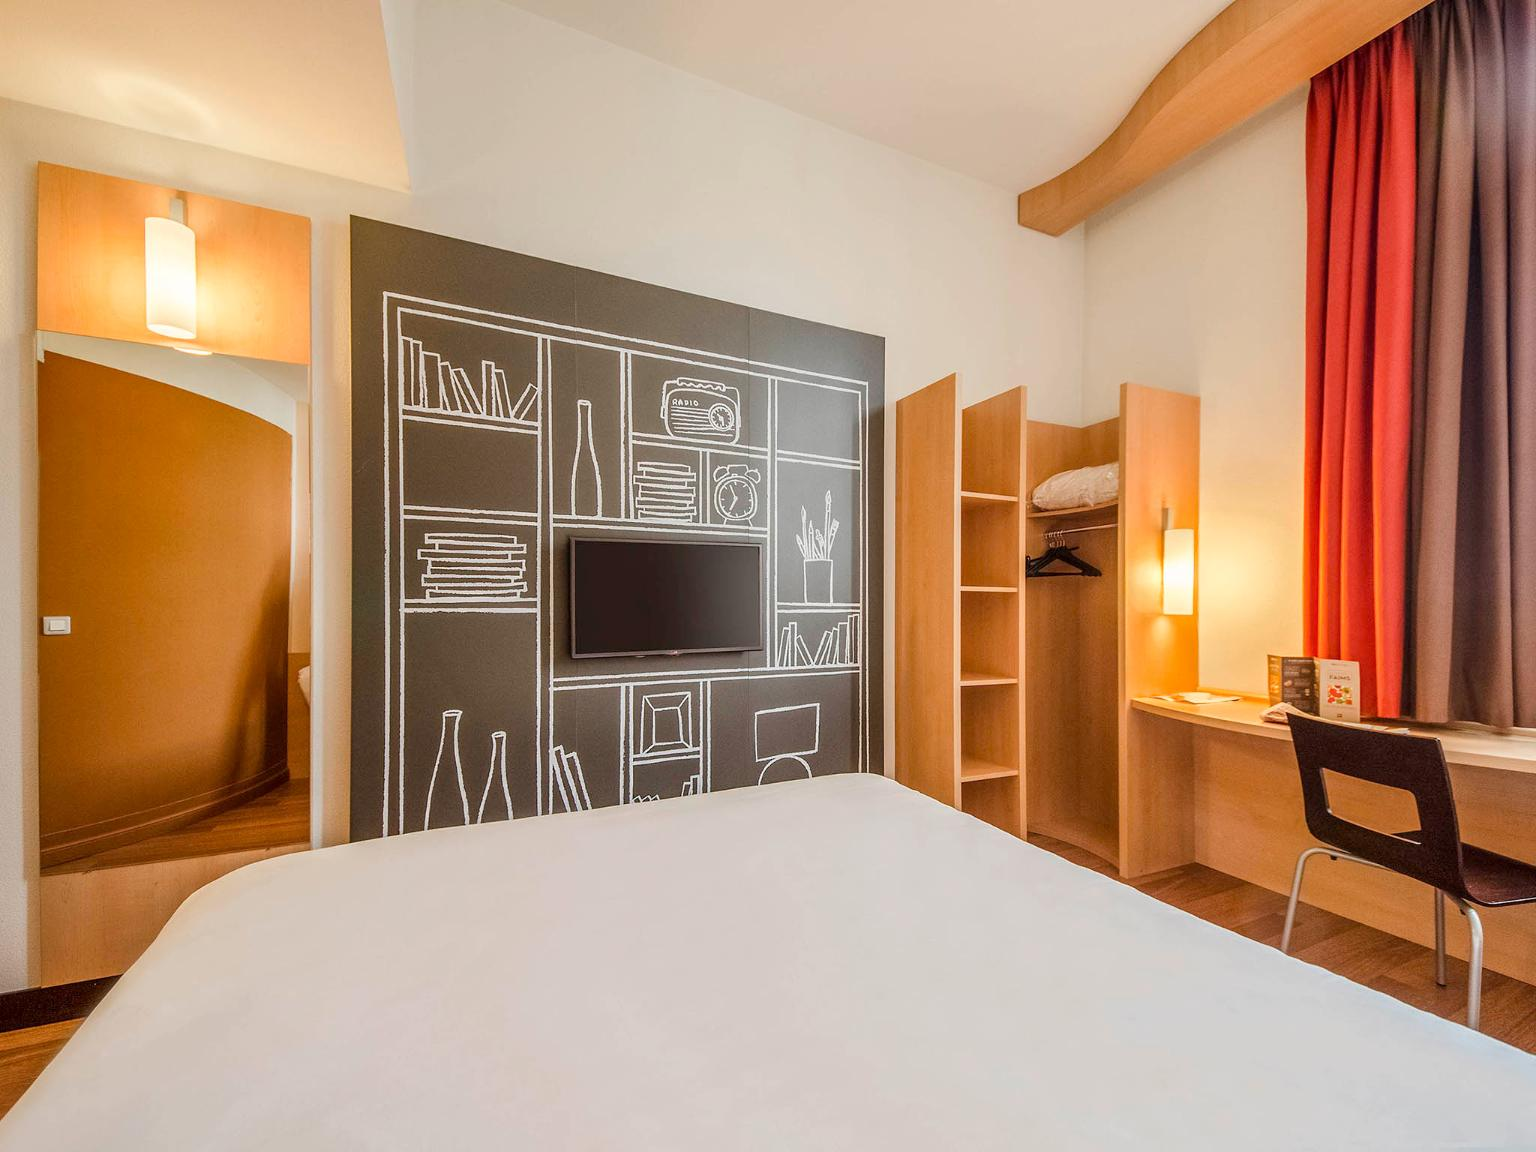 Hotel Ibis En Dordogne